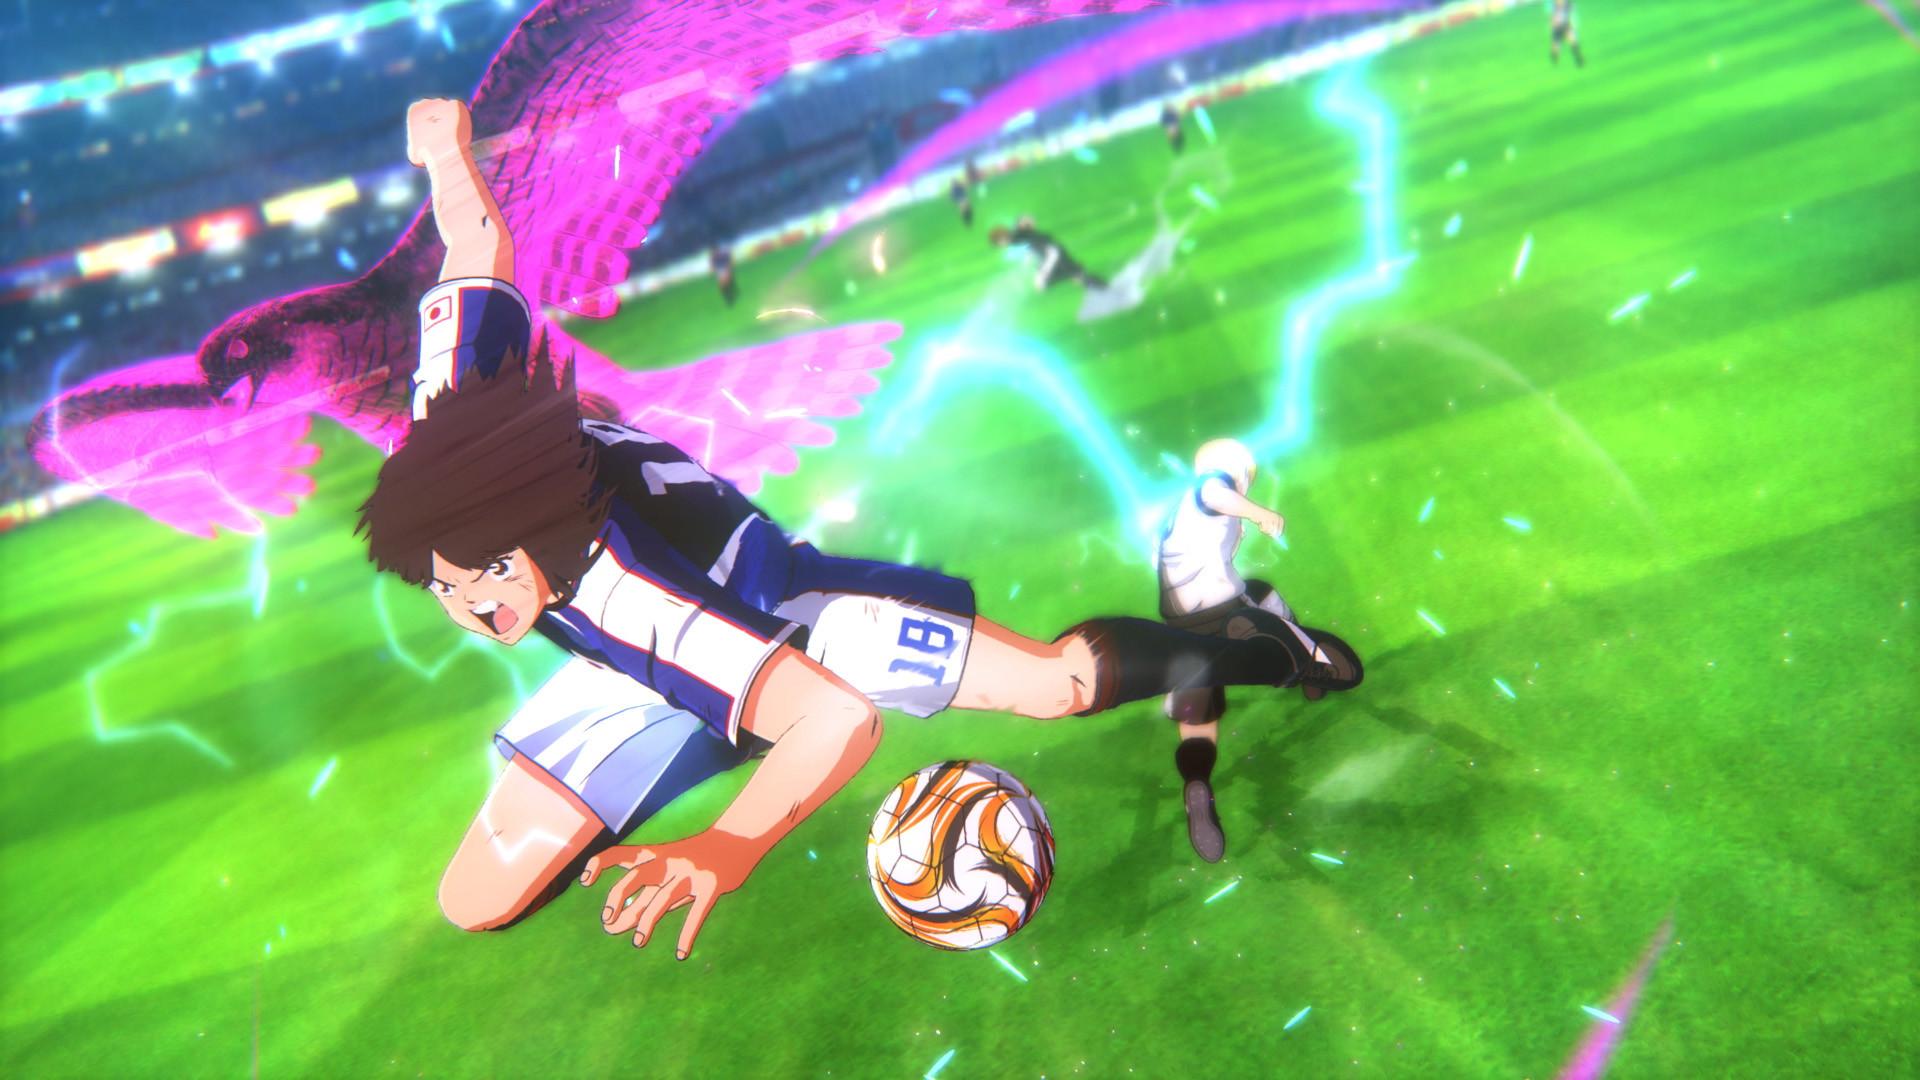 足球小将/队长小翼:新秀崛起/CAPTAIN TSUBASA: Rise of New Champions(更新1.05)插图4